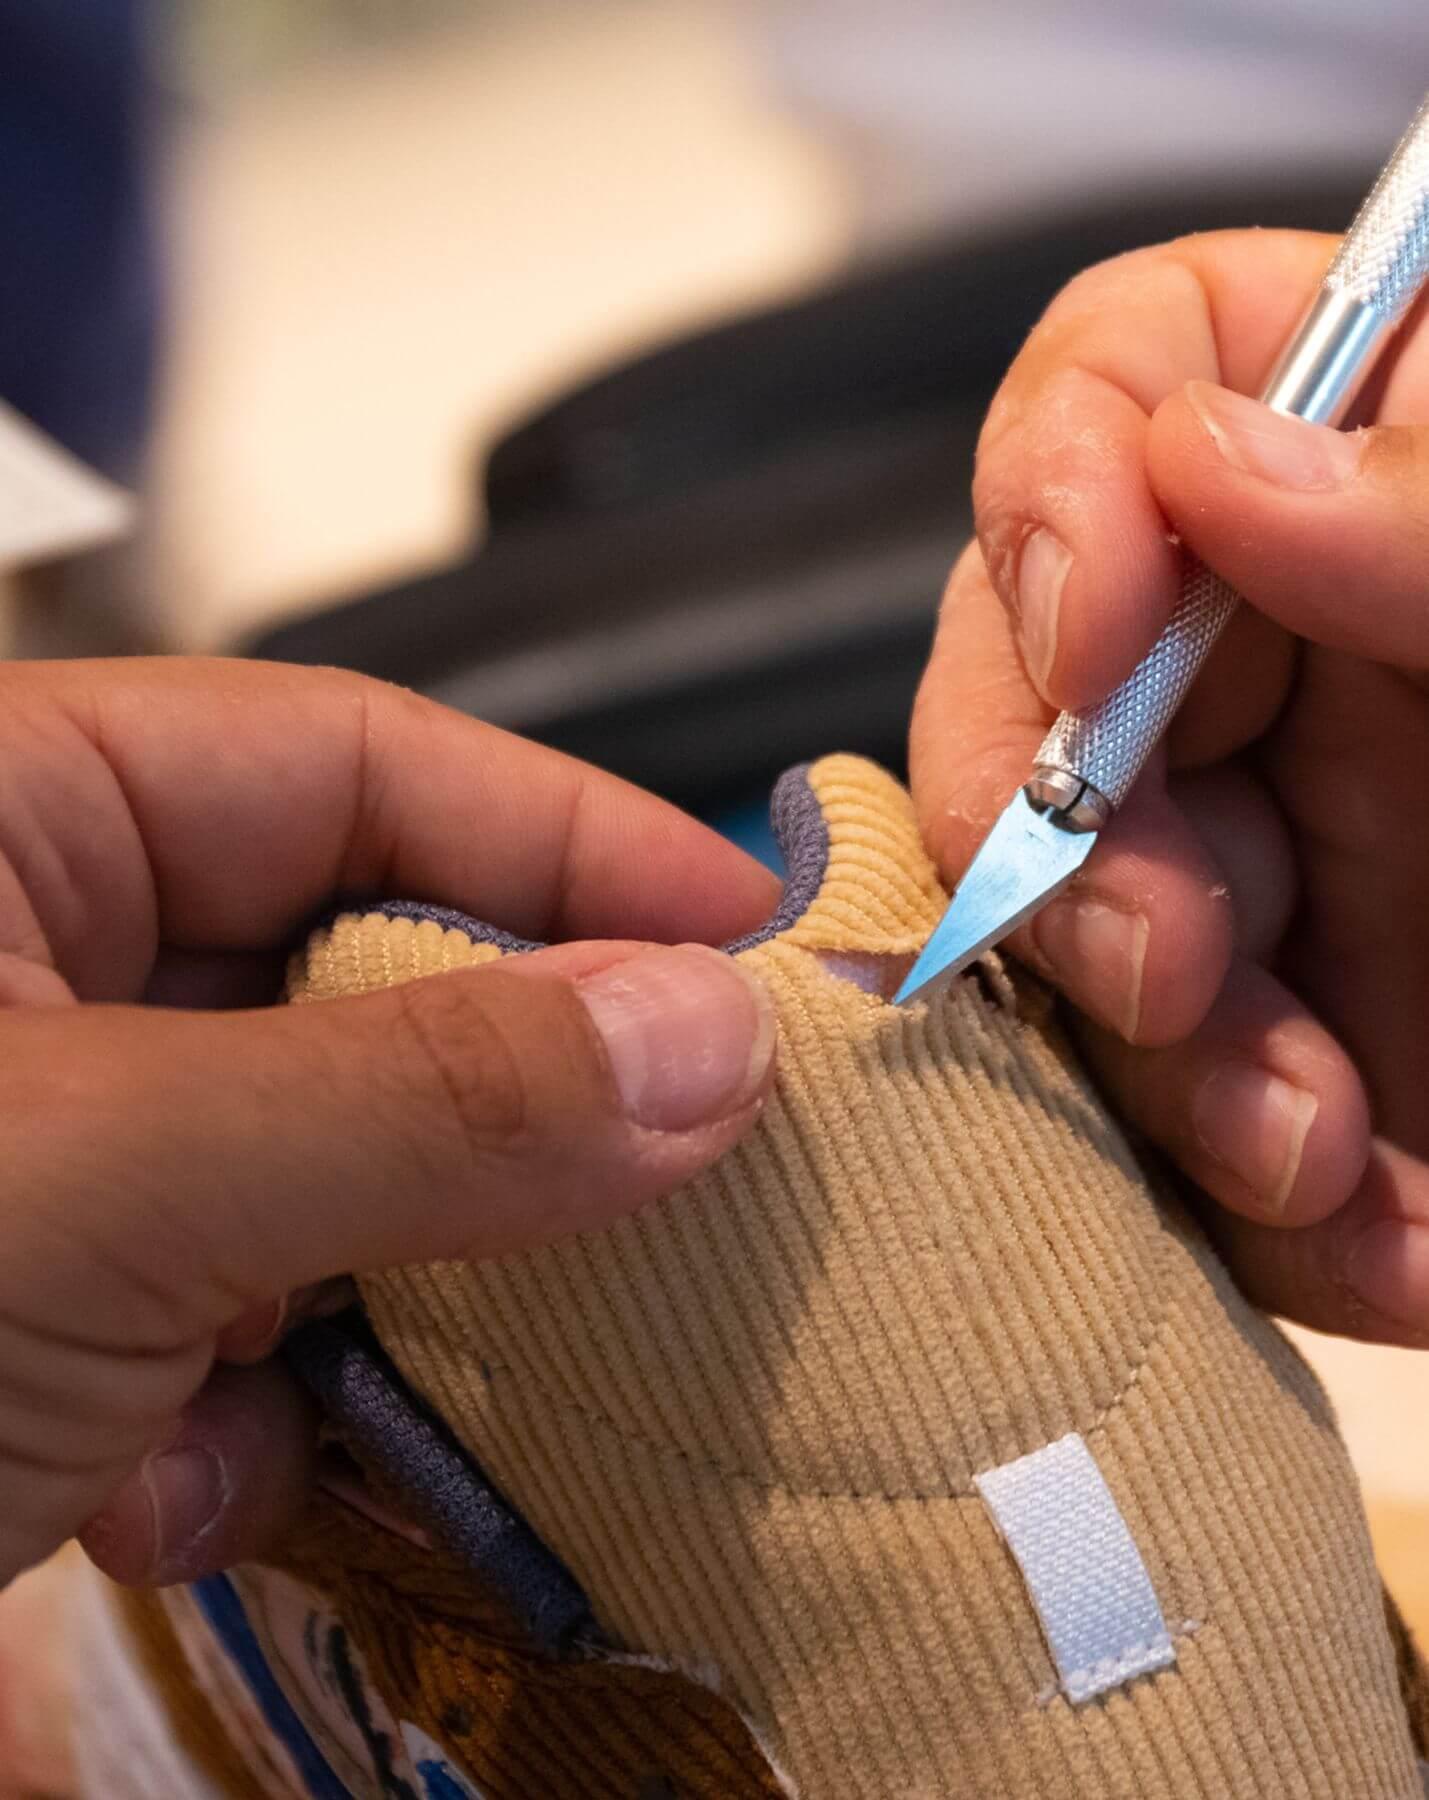 scalpel / skalpell - details customizing Mizuno x Shinzo Paris - Contender - brown/blue - cherry blossom